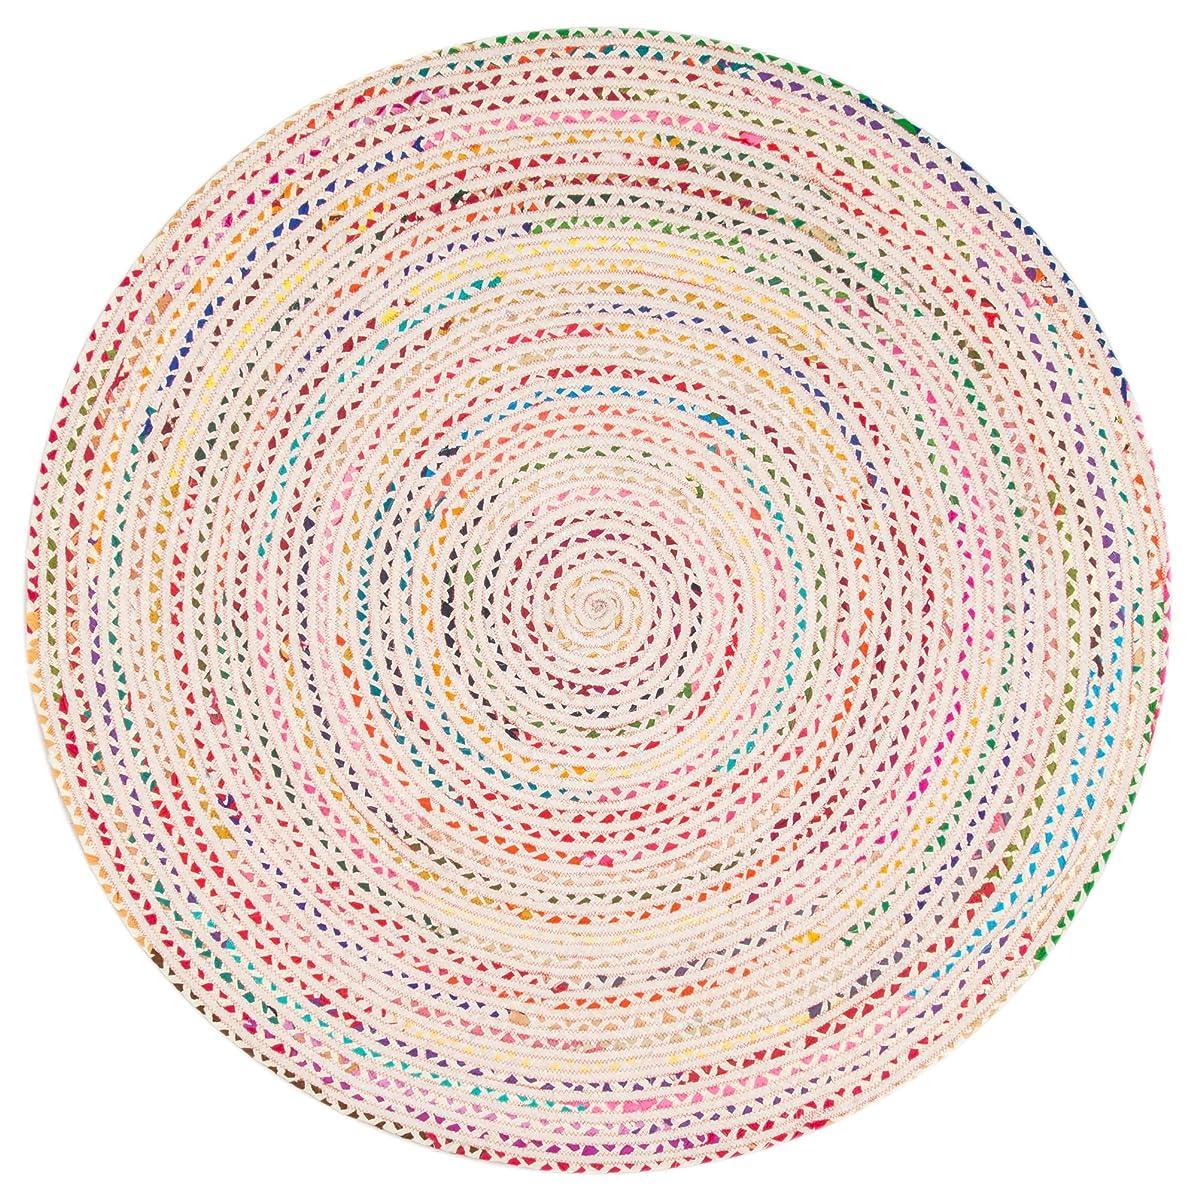 nuLOOM Hand Braided Tammara Rug, 5 x 8, Ivory